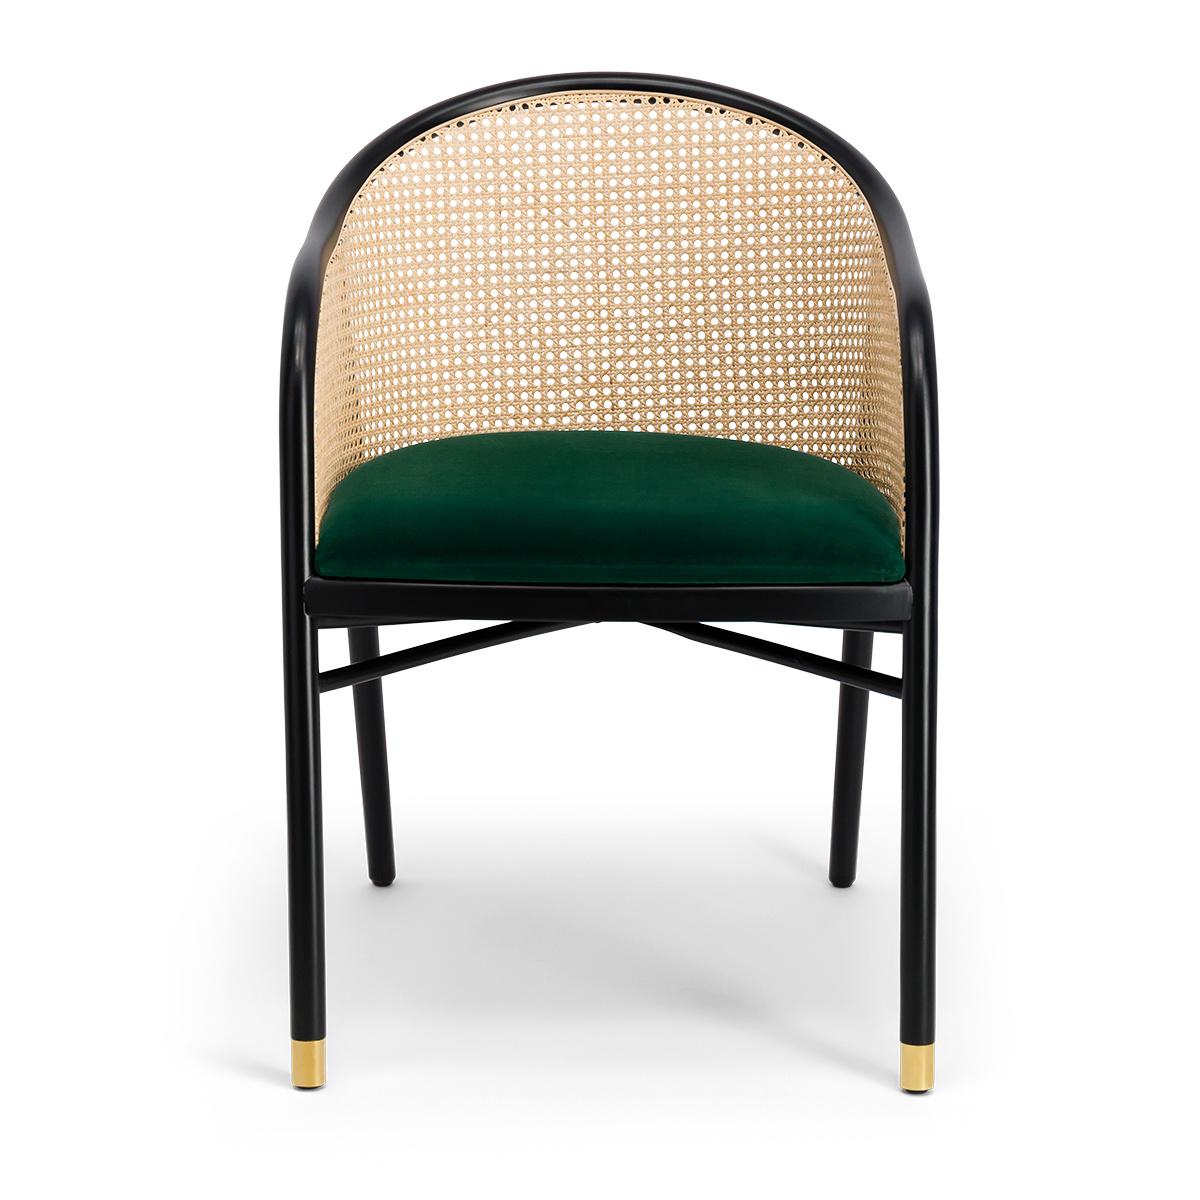 Cavallo Armchair, Fir Green Velvet with Black Lacquered Frame